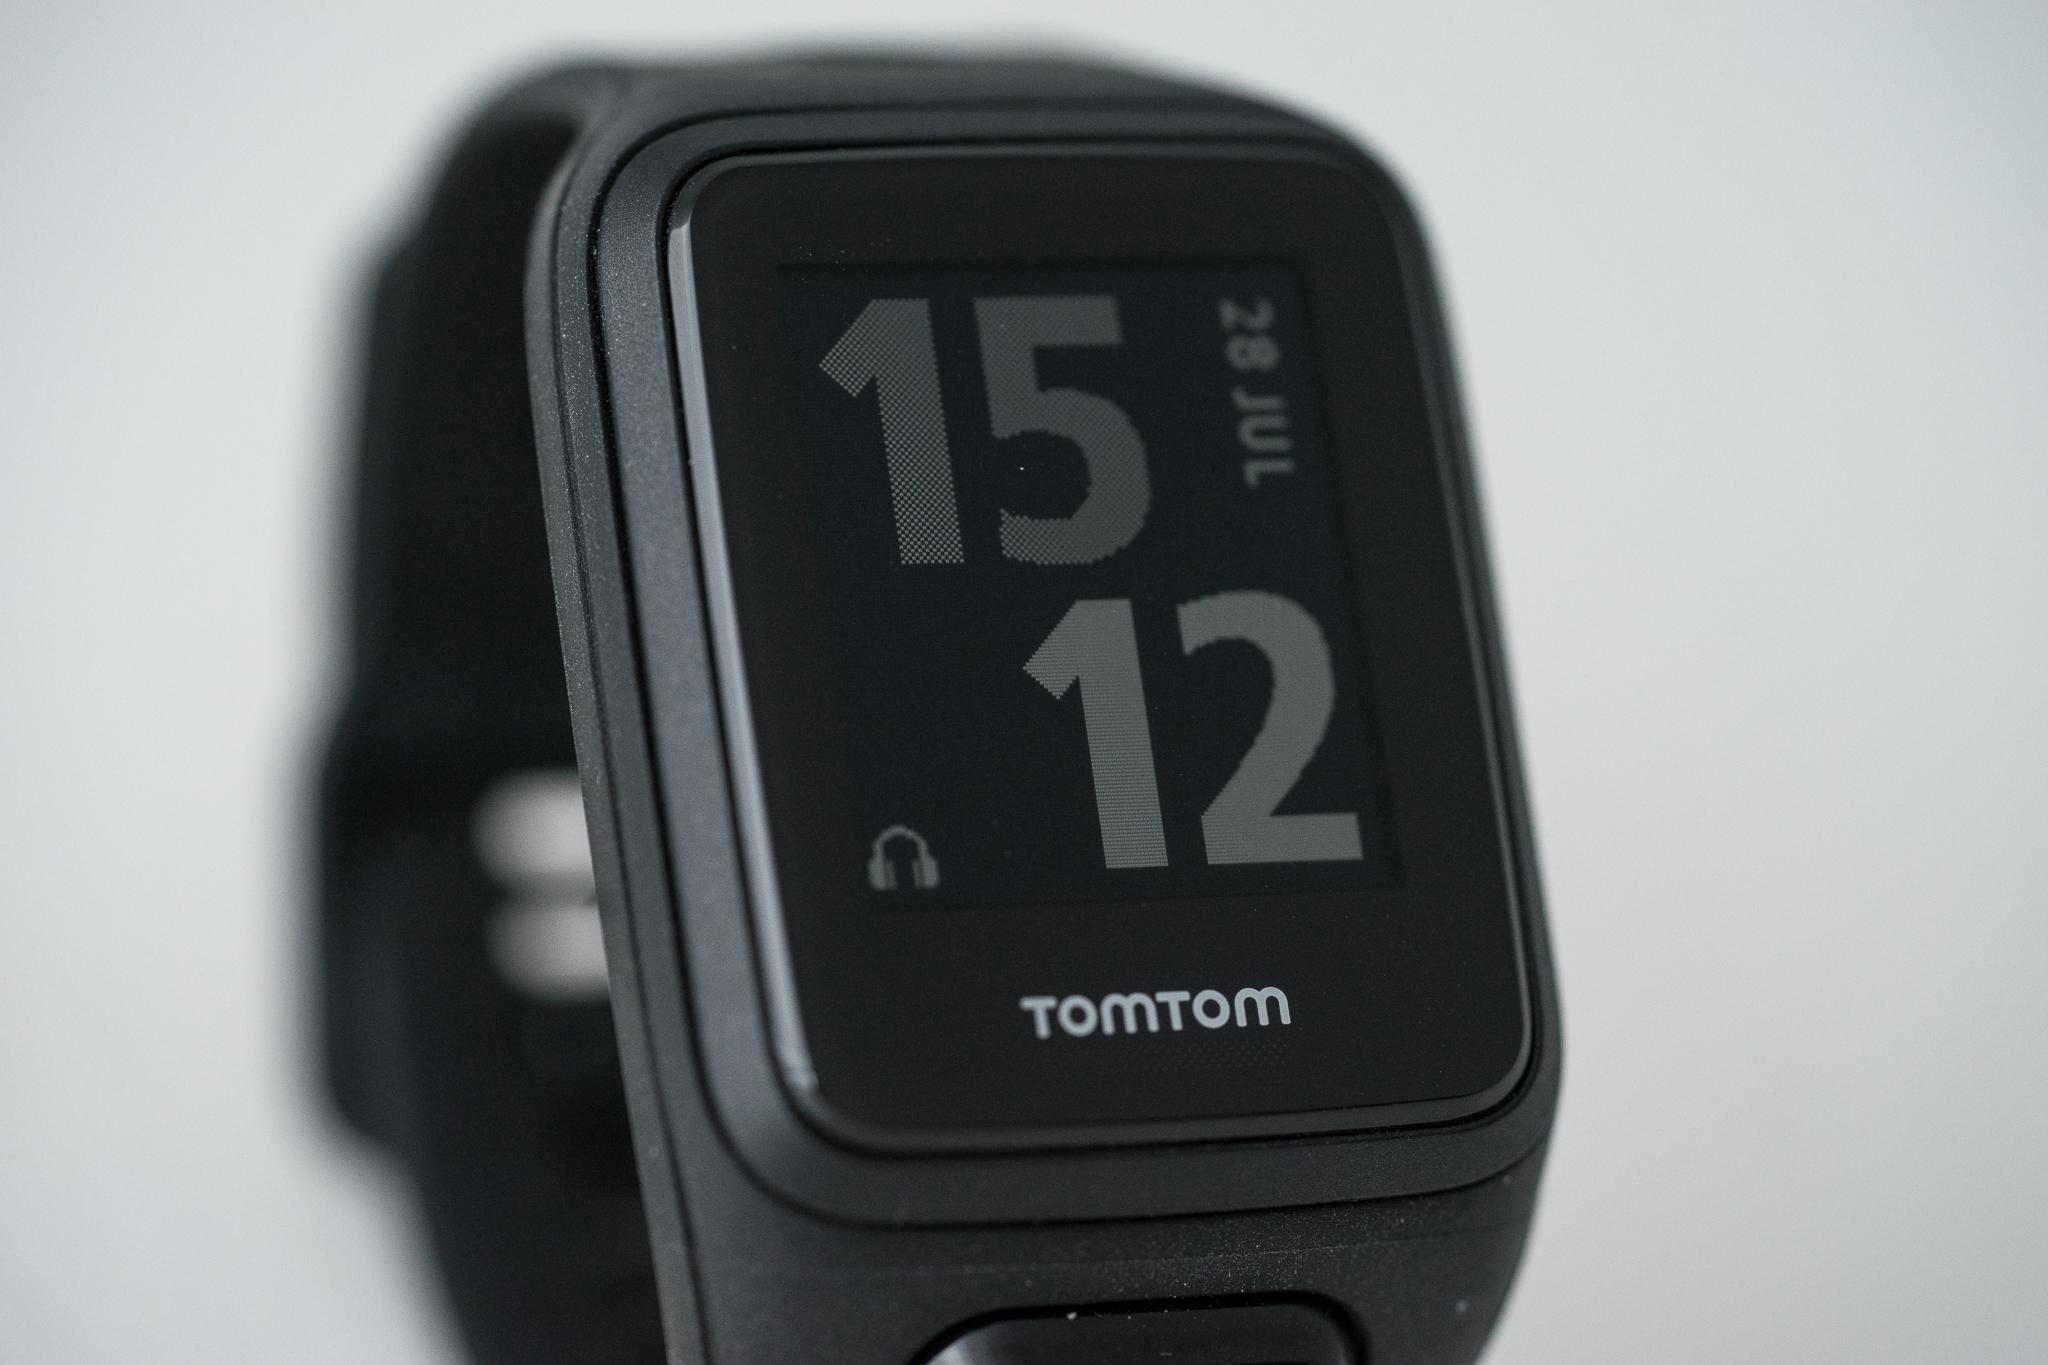 TomTom-07582